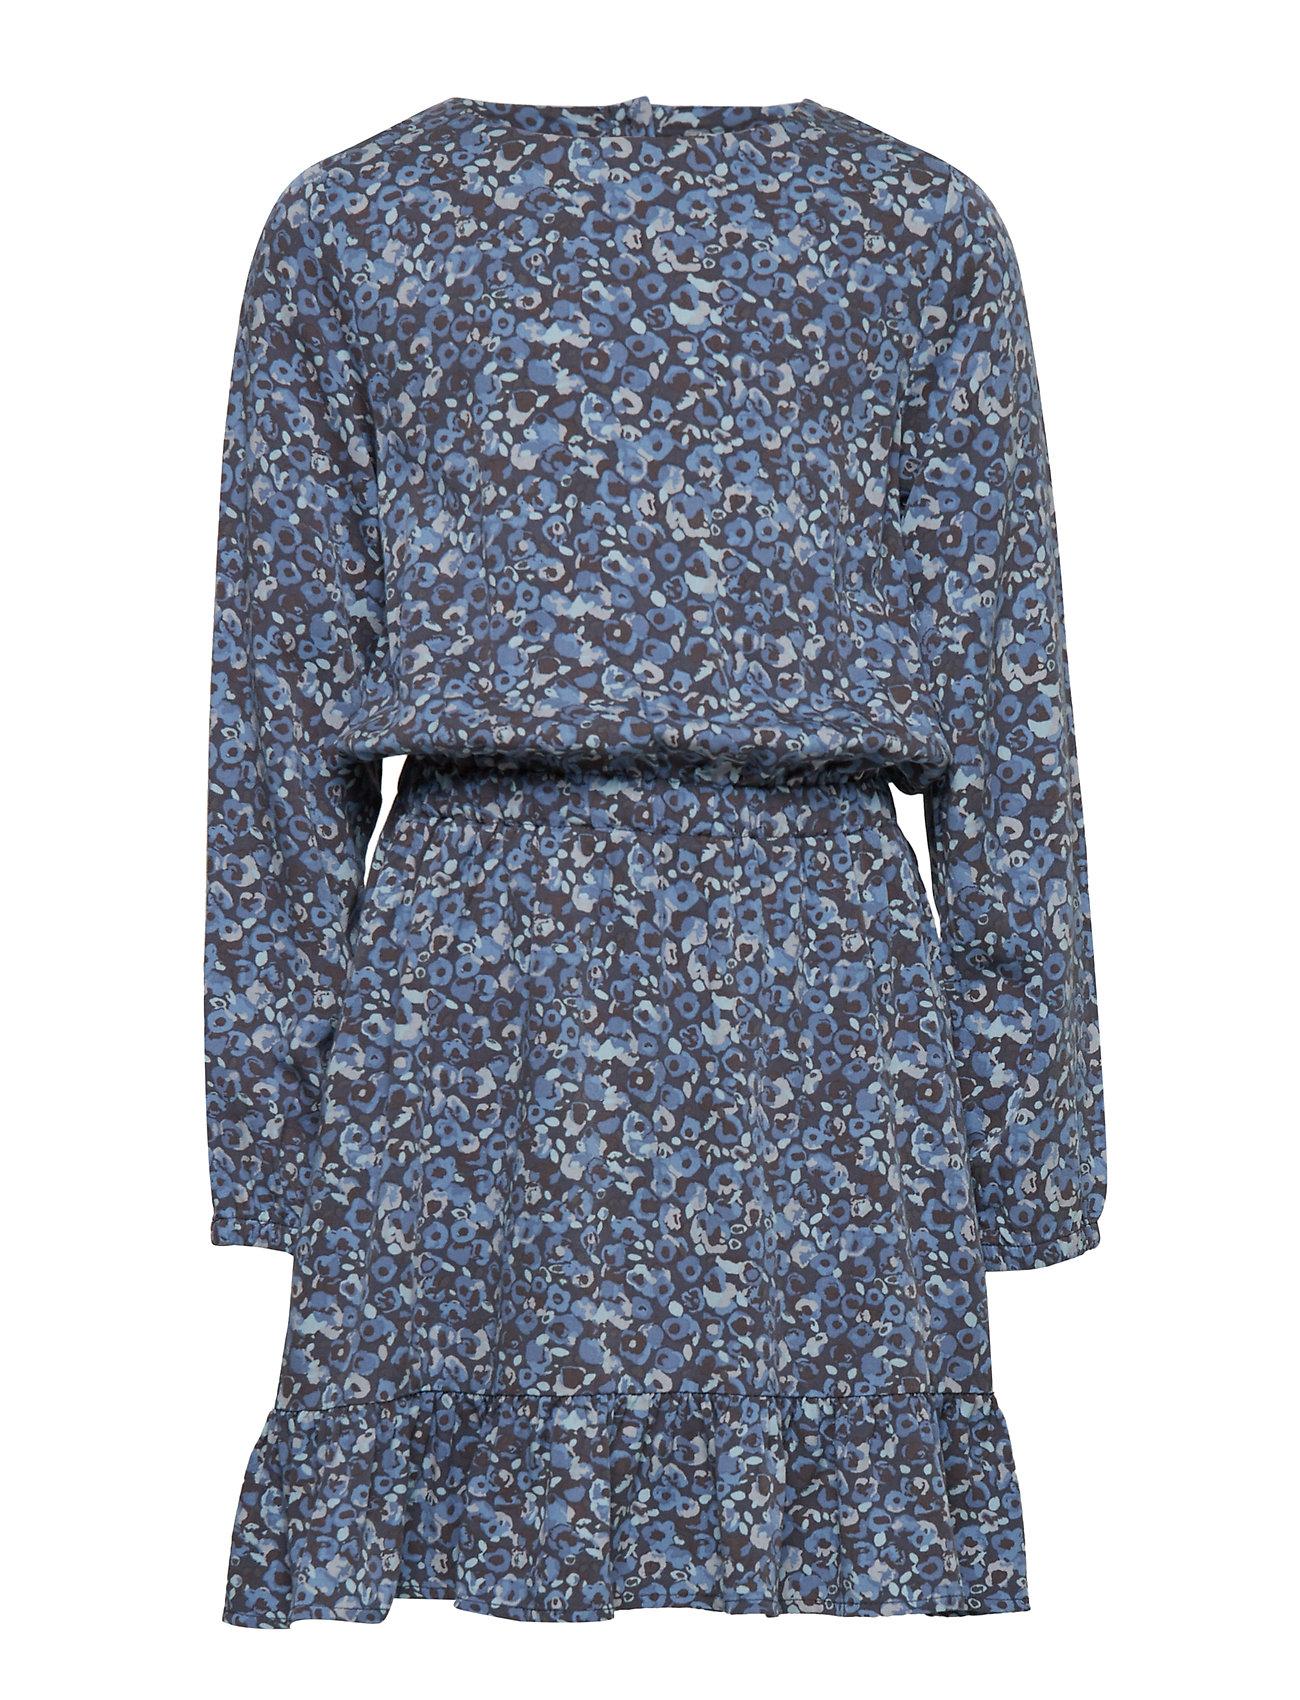 Wheat Dress Benta - GREYBLUE